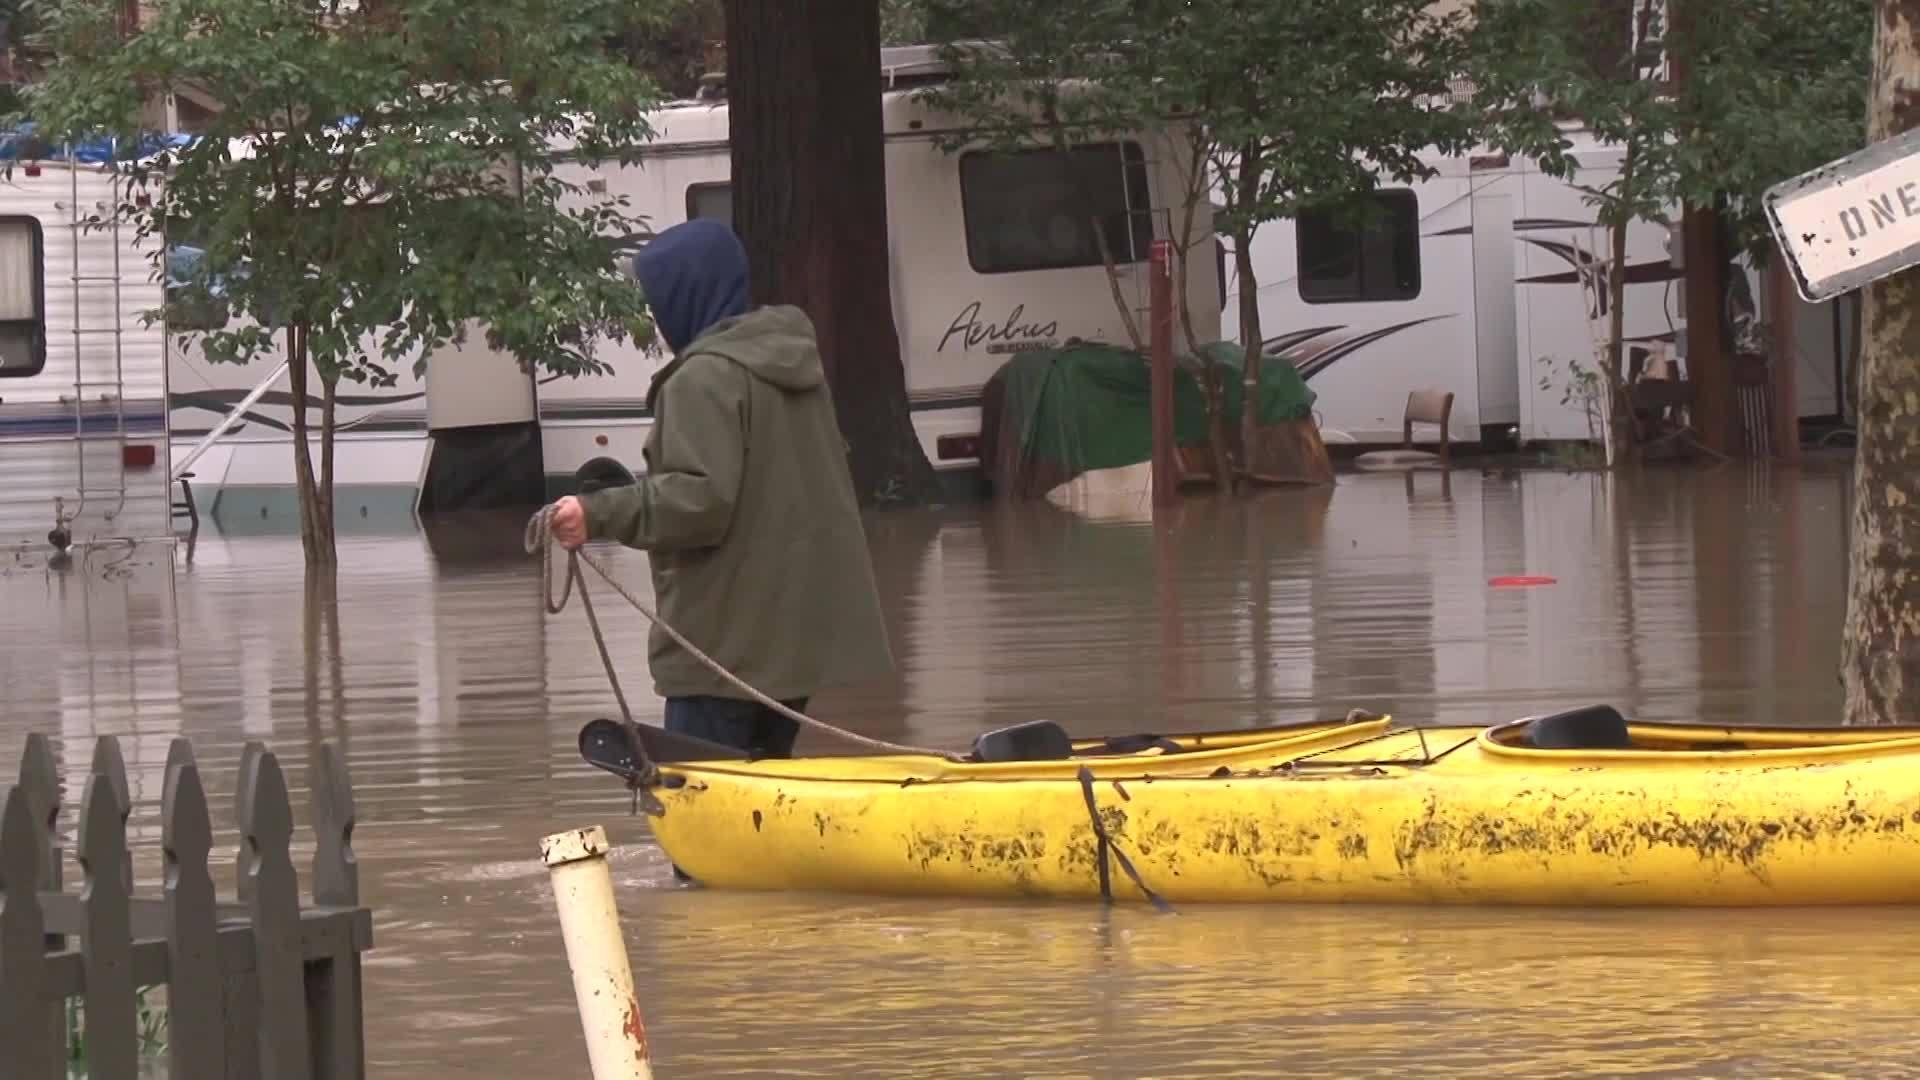 Russian_River_floods_part_of_Guerneville_3_20190214195818